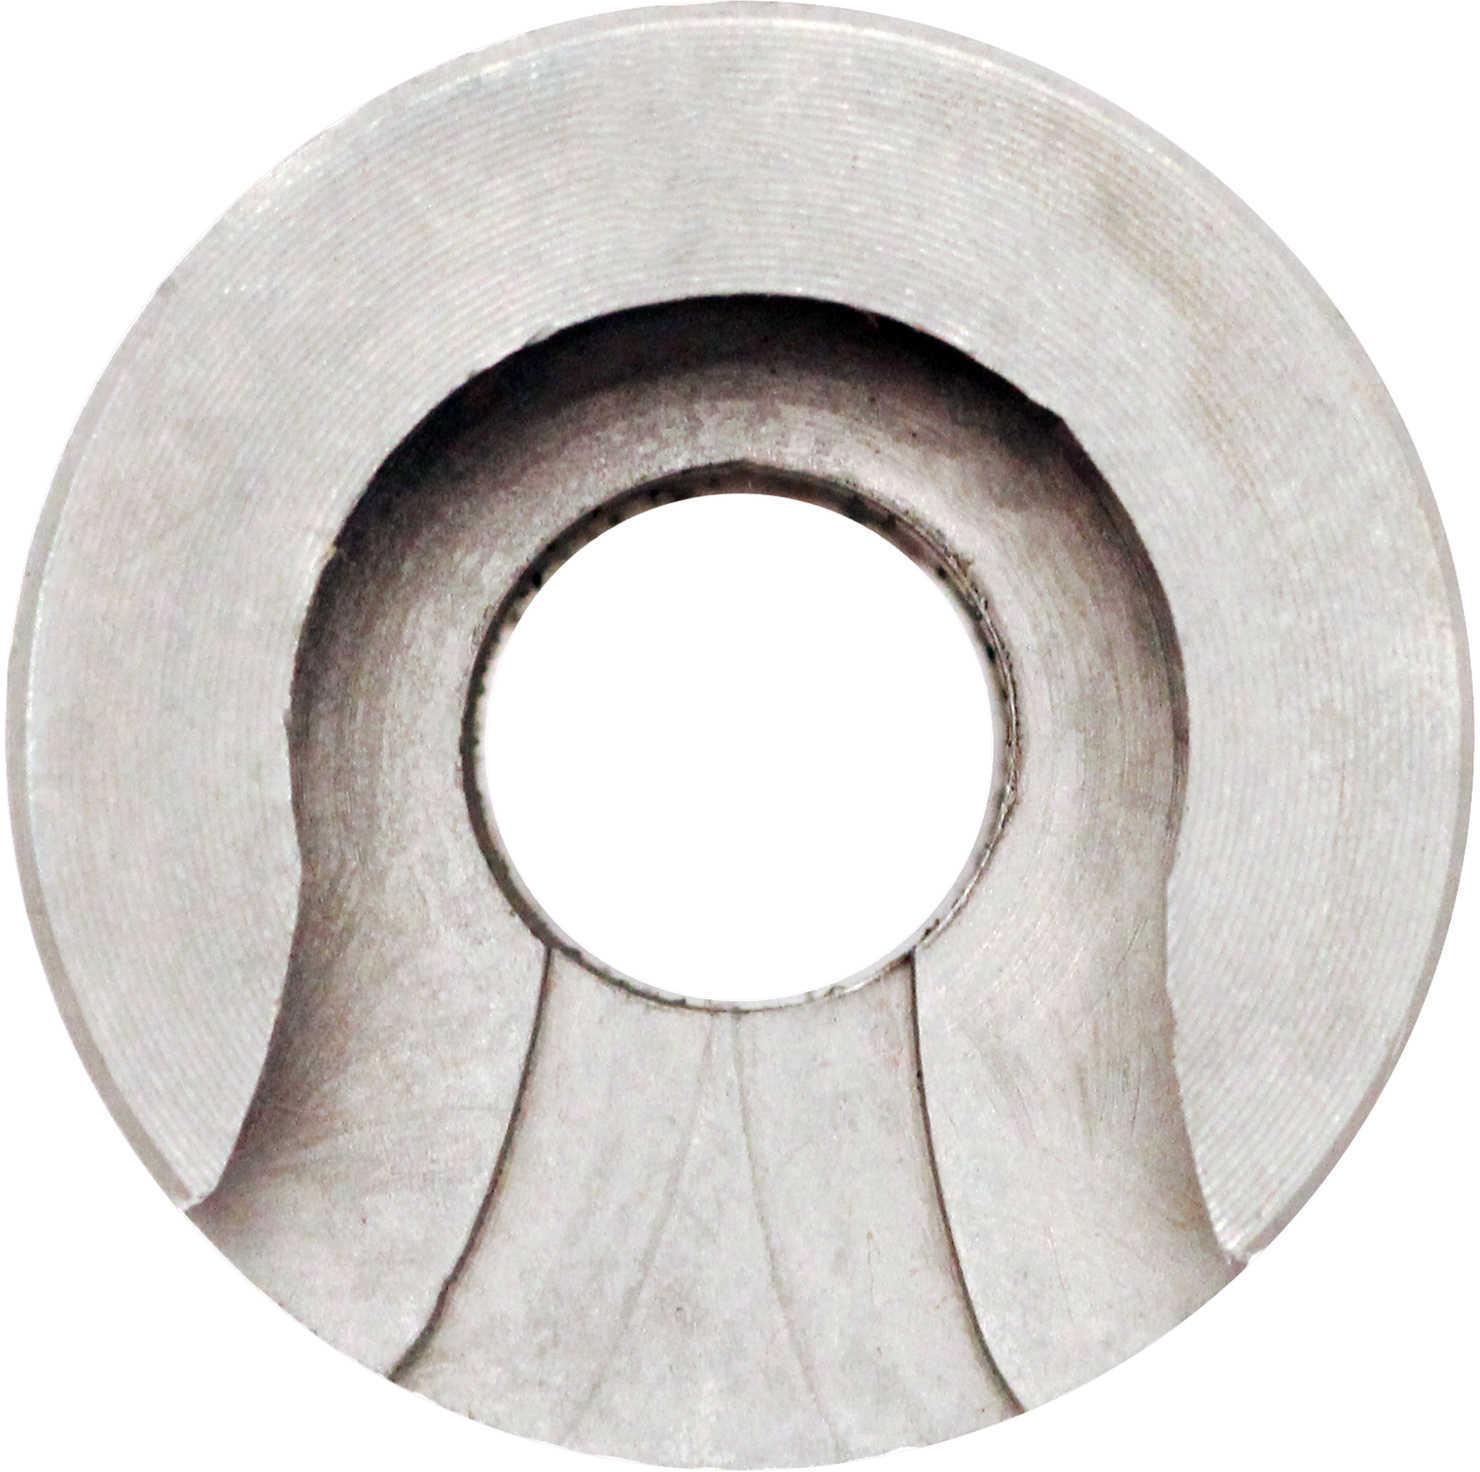 Hornady Shell Holder Size 2 Md: 390542